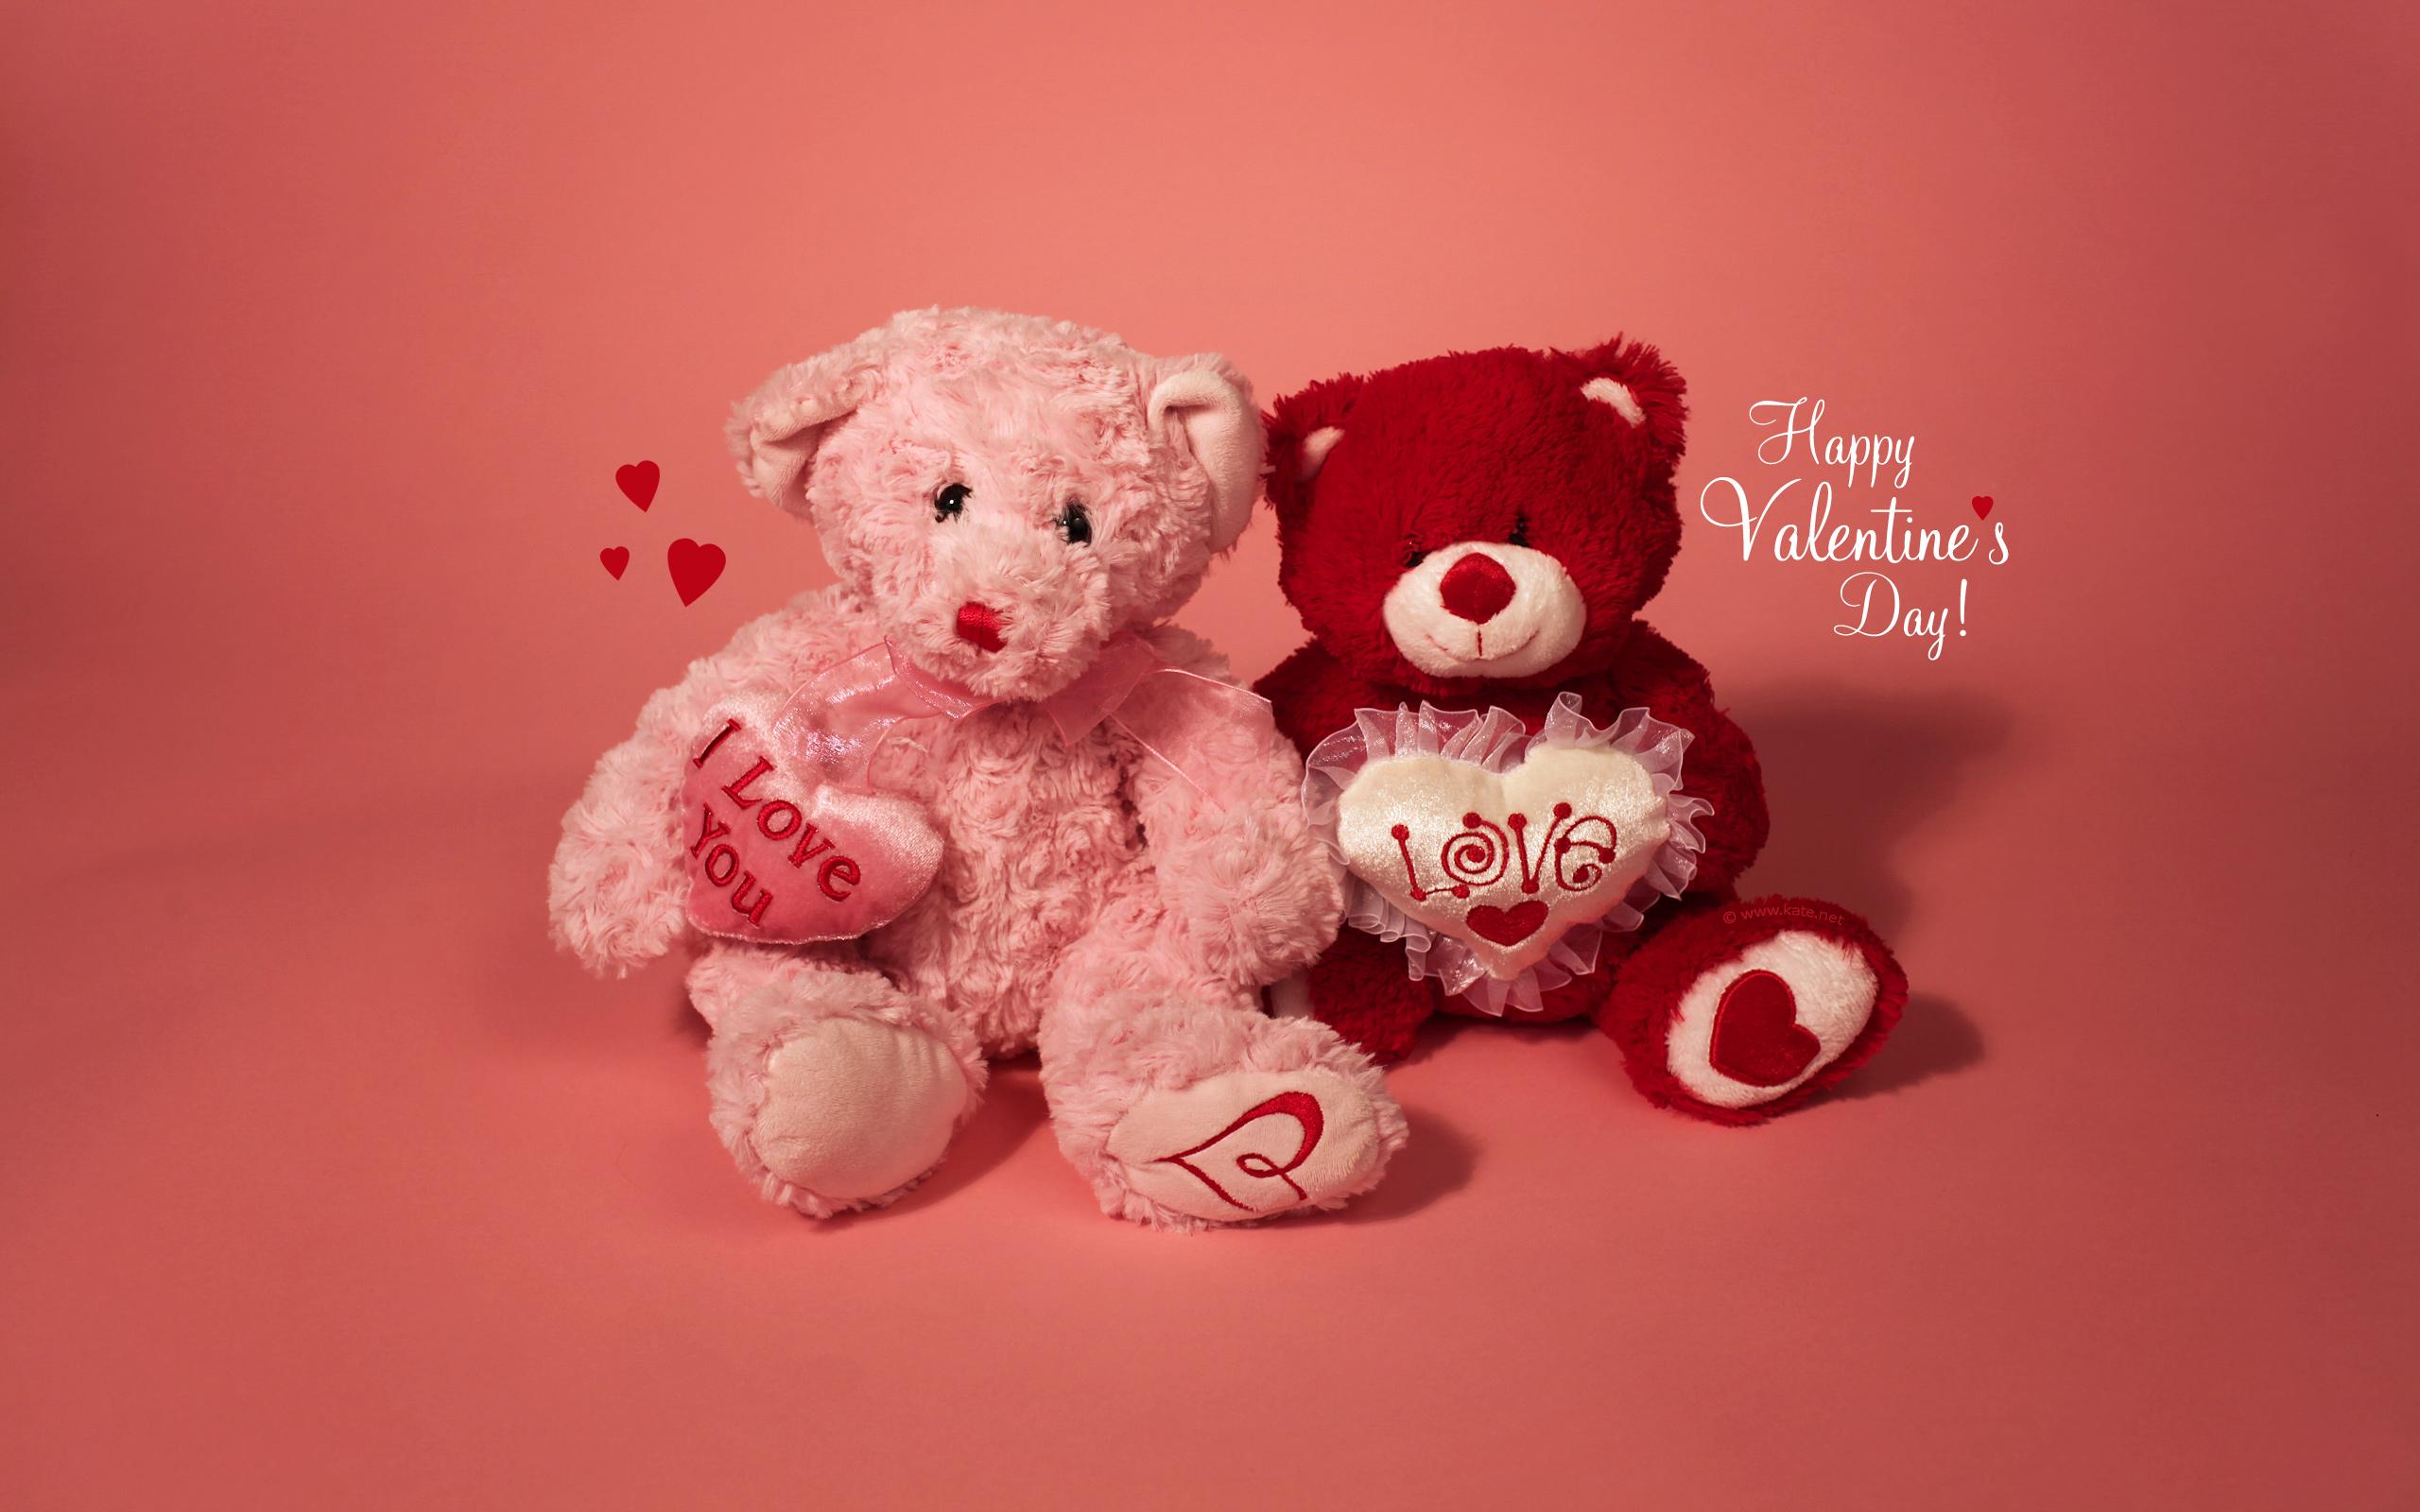 Happy Valentines Day 2016 Images   Happy Birthday Cake Images 2560x1600